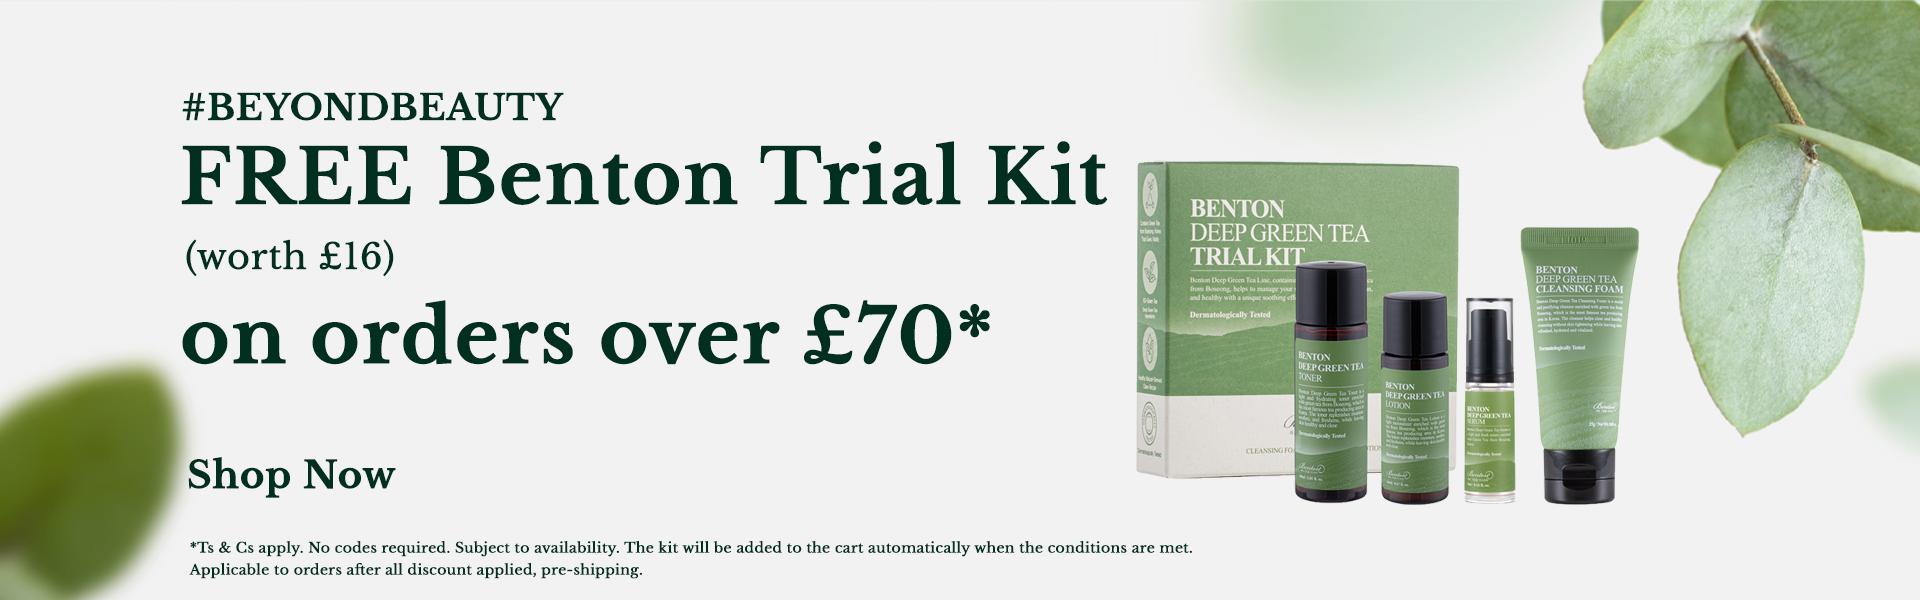 Free Benton Gift